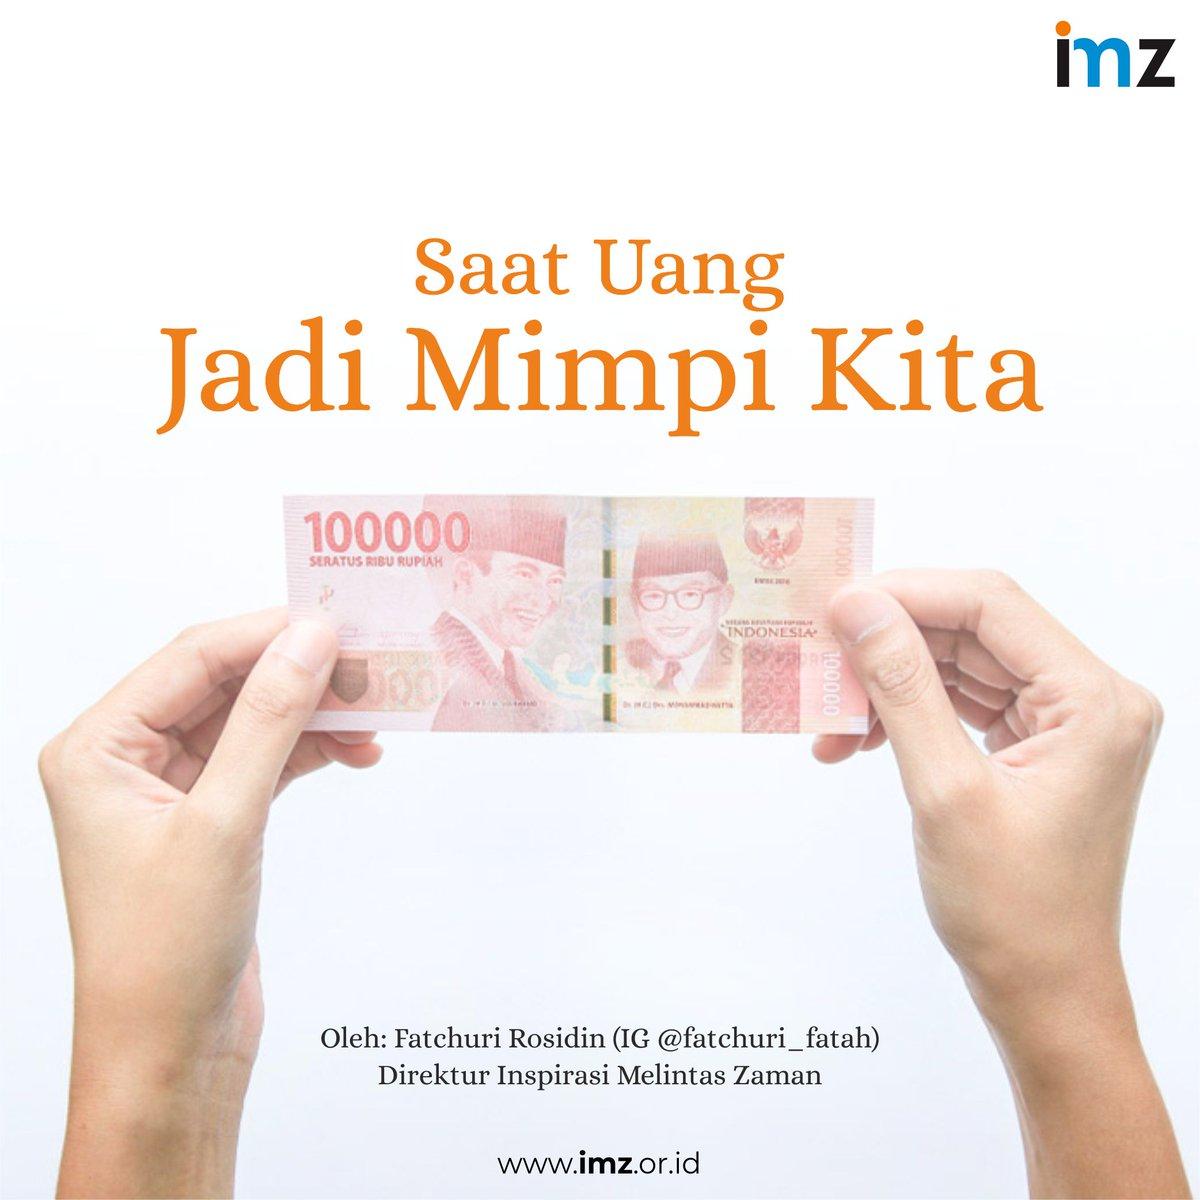 When Money Is Our Dream | https://t.co/7THuvDfZEI  Inspirasi Melintas Zaman (IMZ Consulting) #artikel https://t.co/0y2jJaDe9E